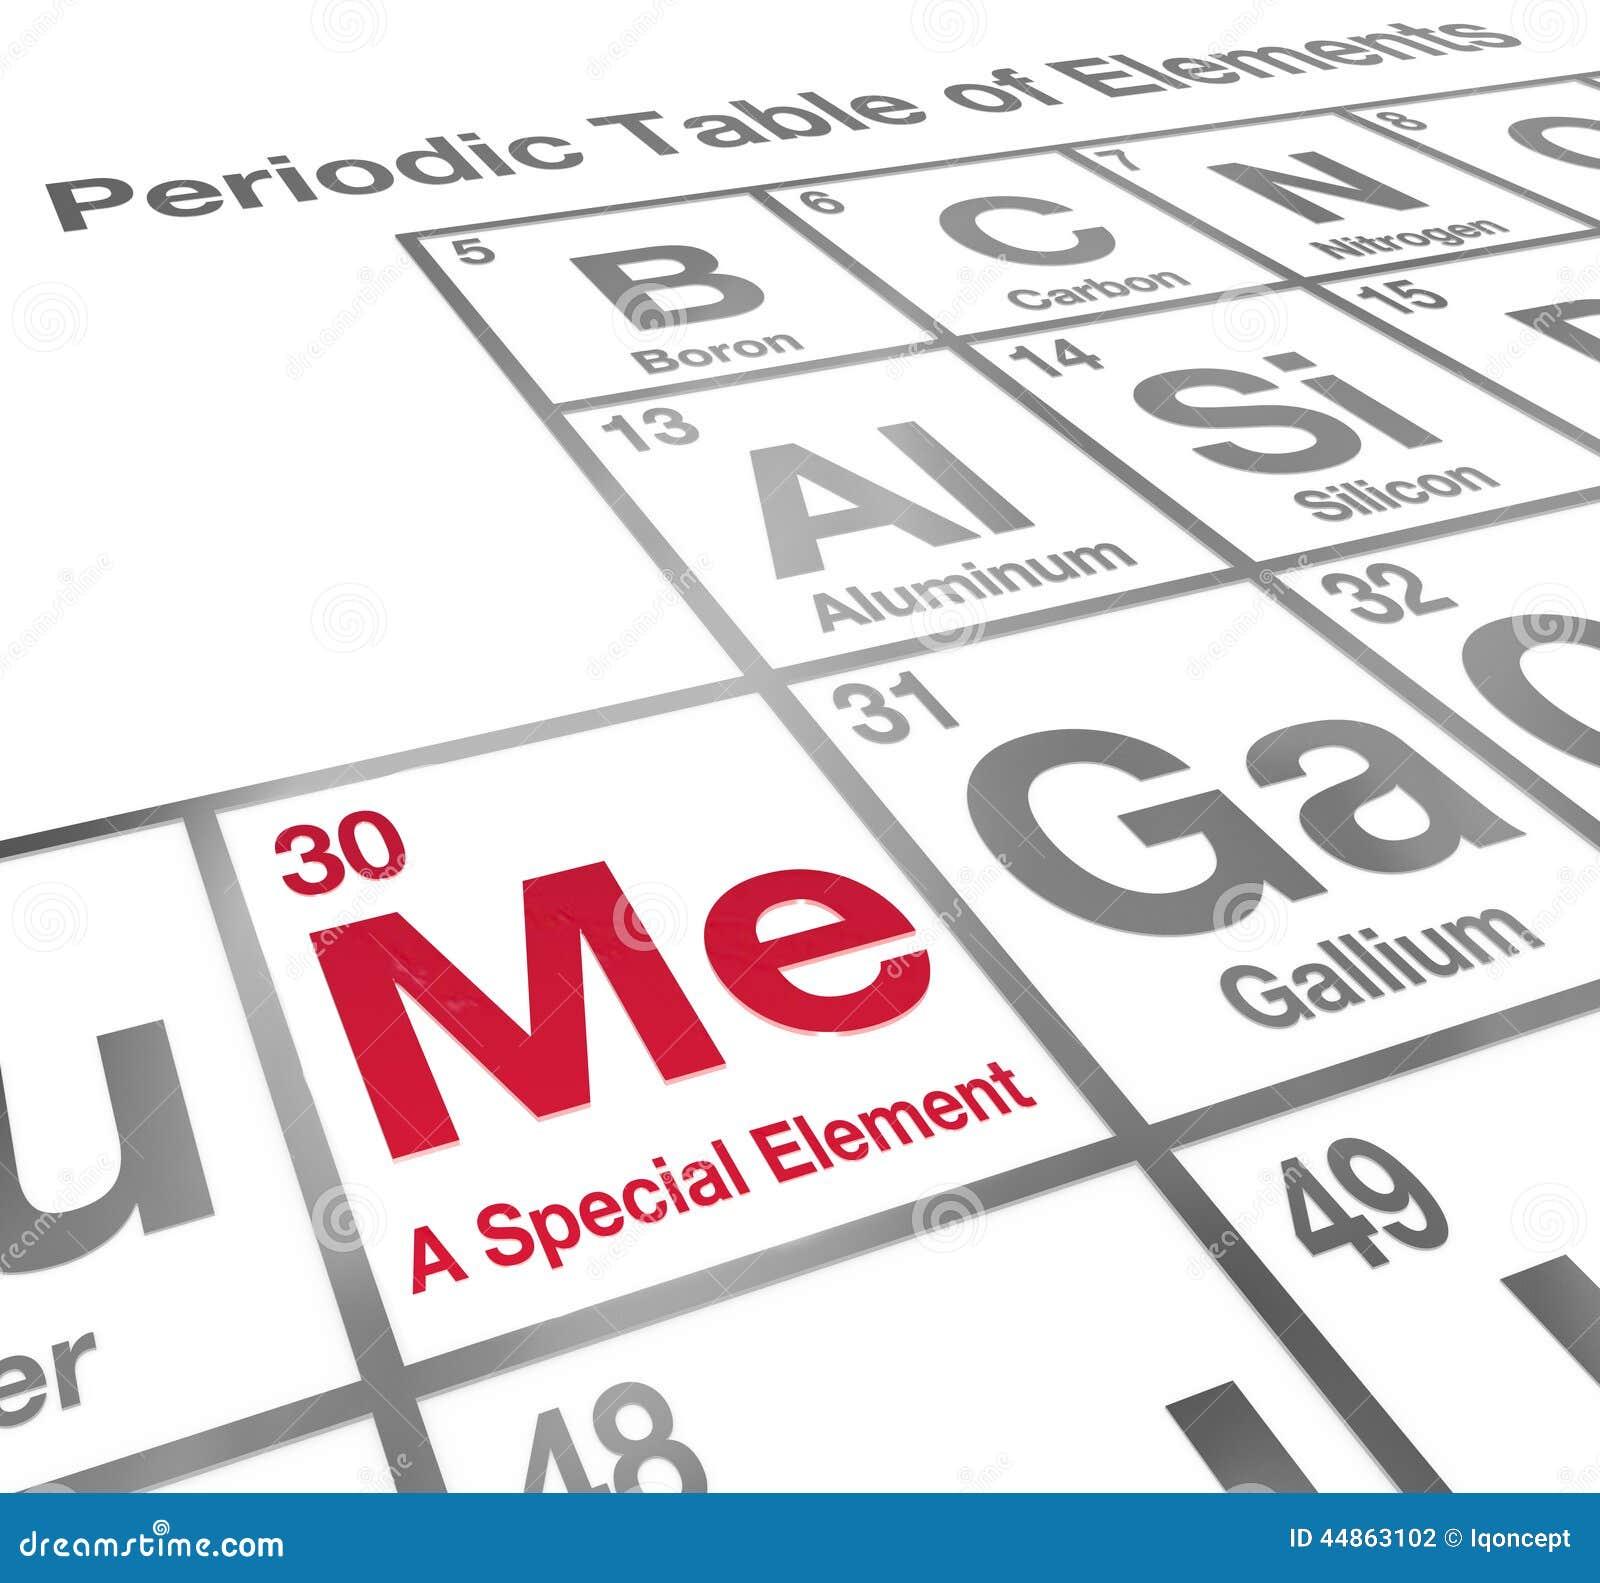 Me Special Element Periodic Table Unique Different Confidence Stock